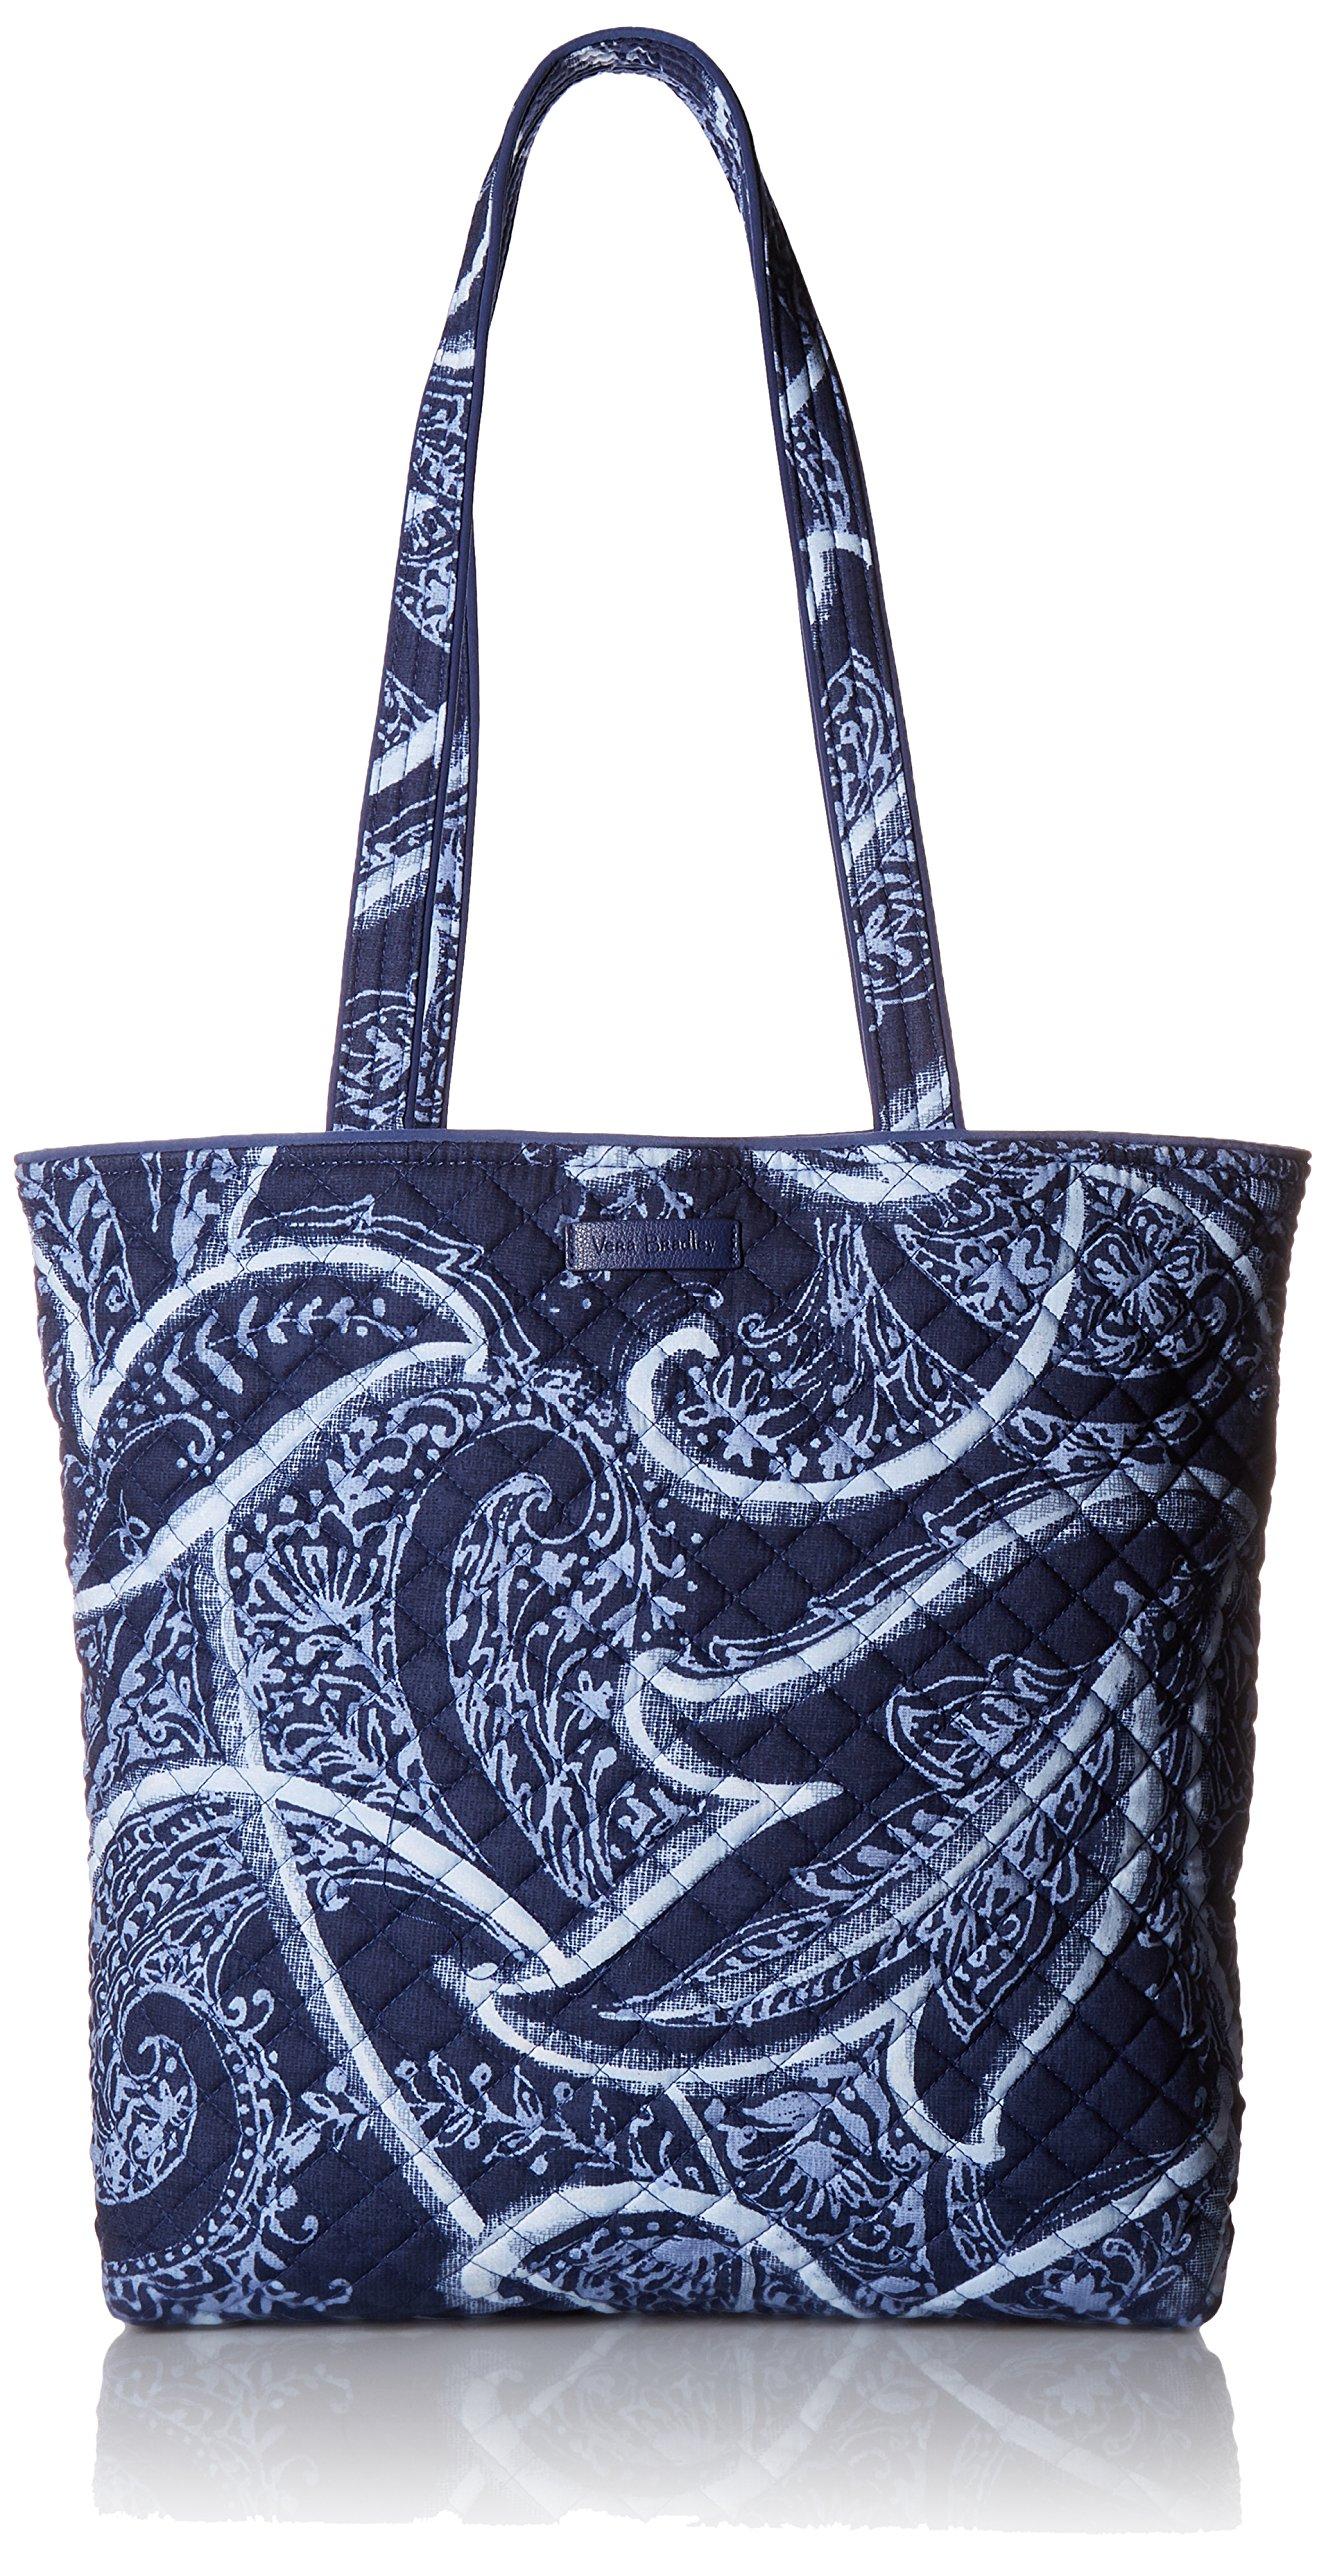 Vera Bradley Iconic Tote Bag, Signature Cotton, Indio, Indio, One Size